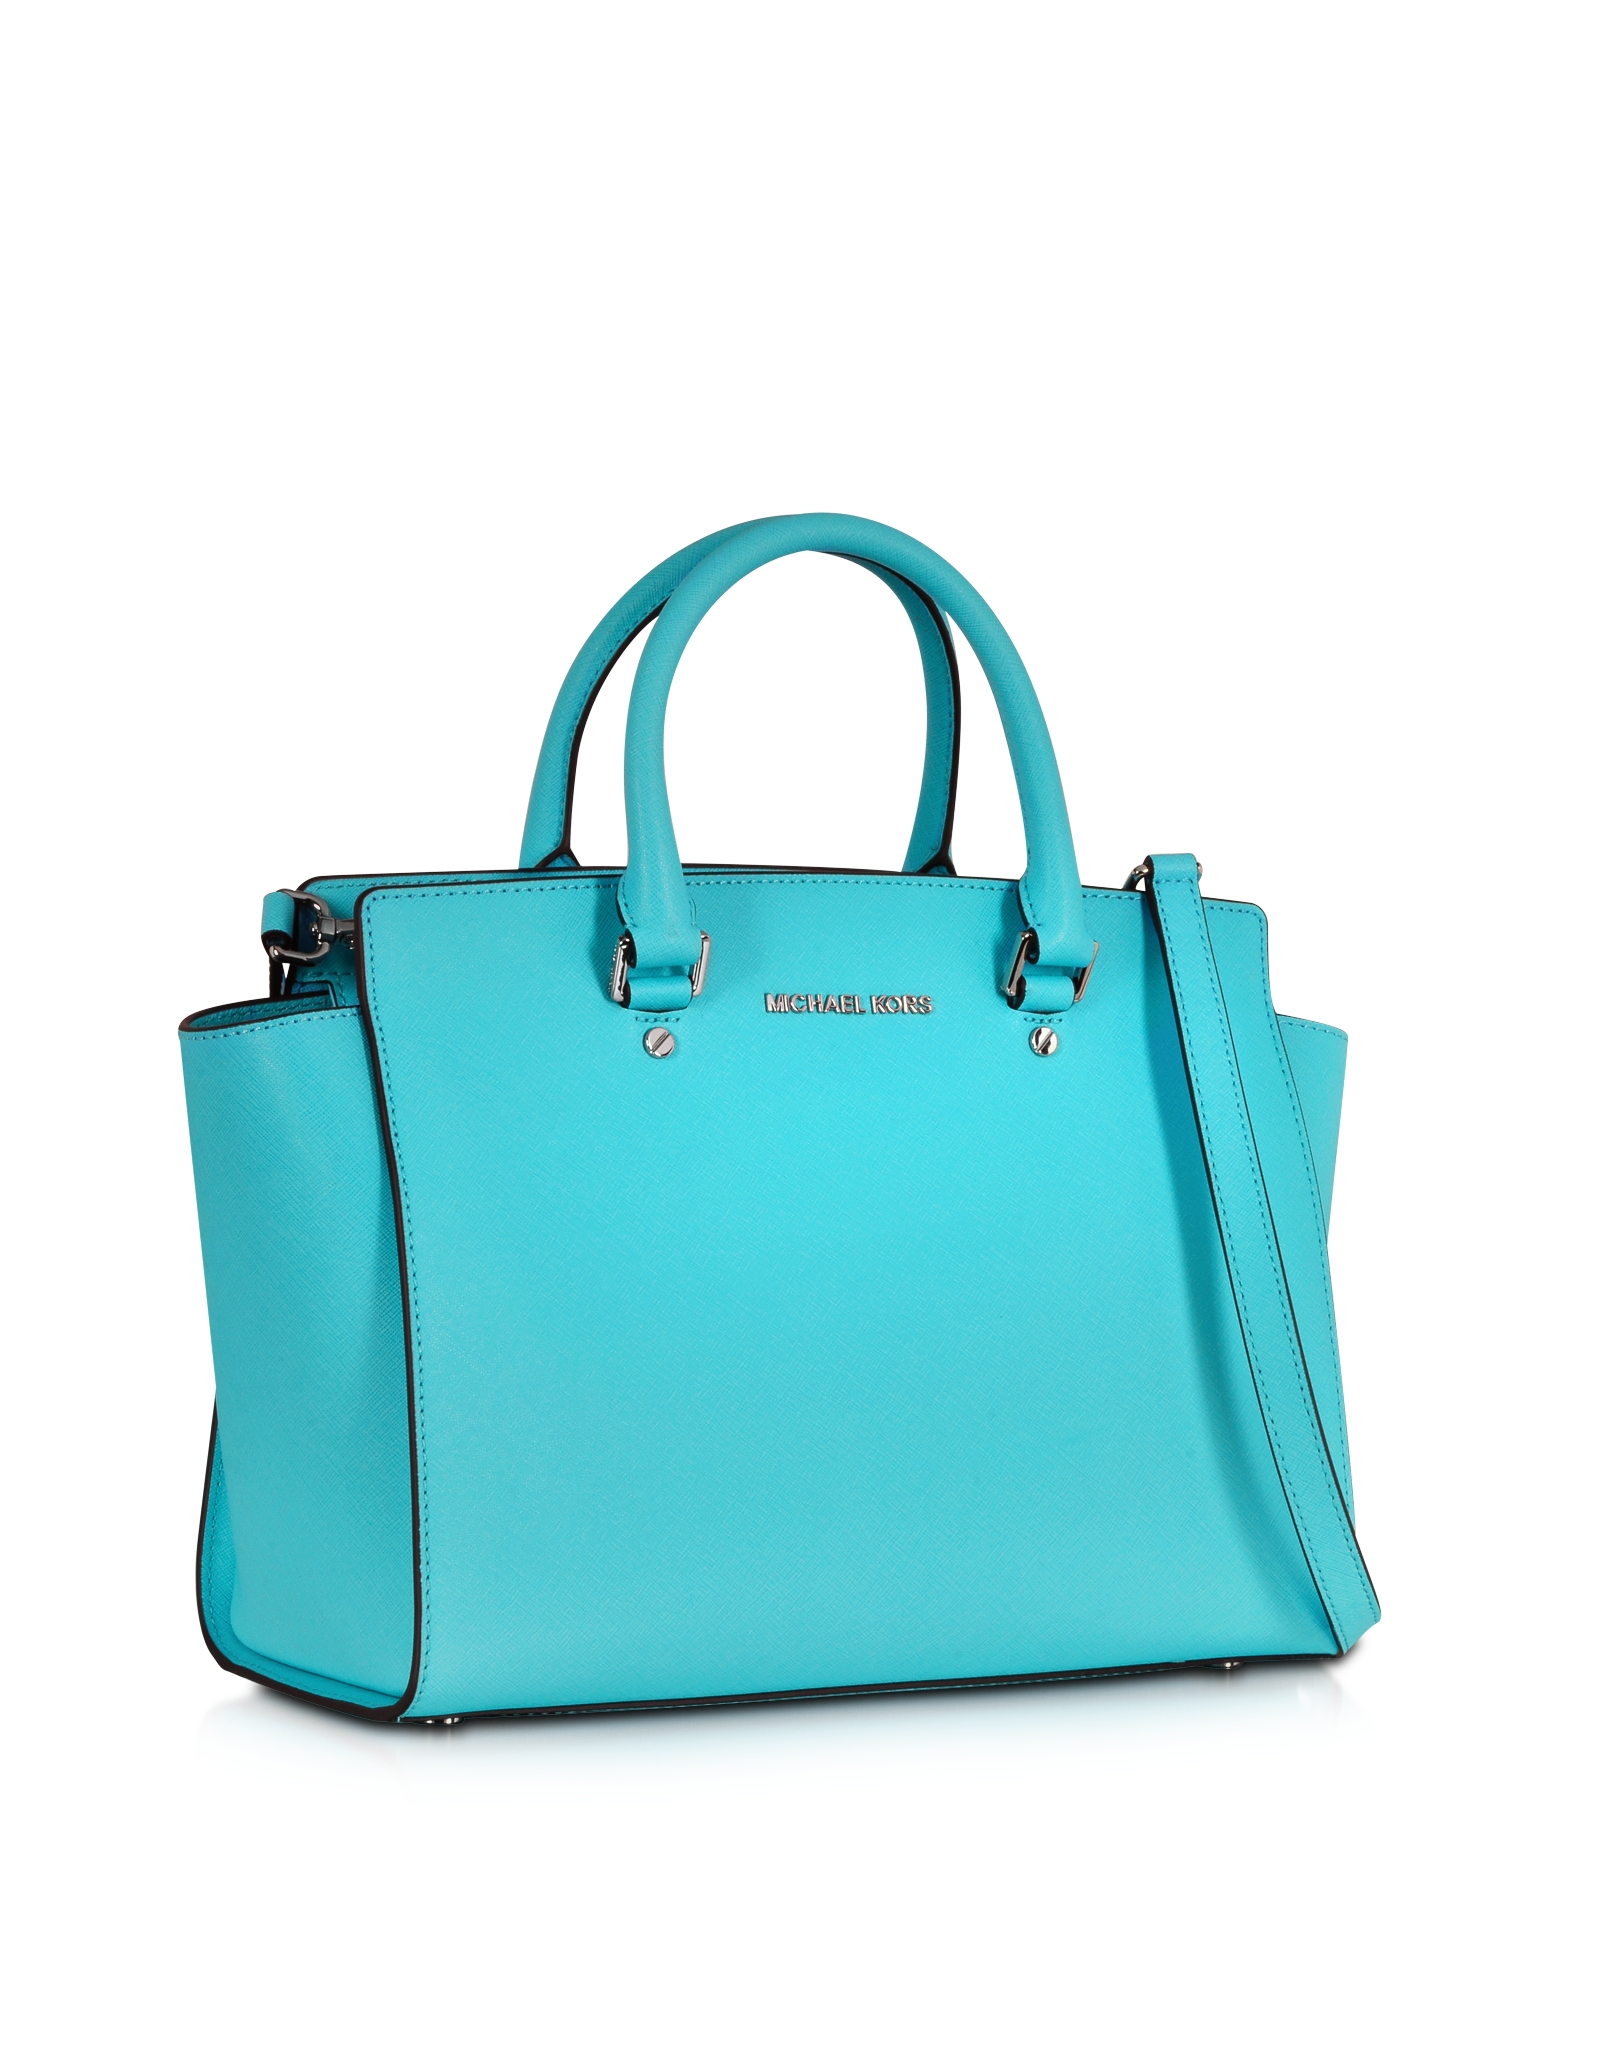 Lyst - Michael Kors Selma Aquamarine Saffiano Leather Large Top-Zip ... 27110e2601